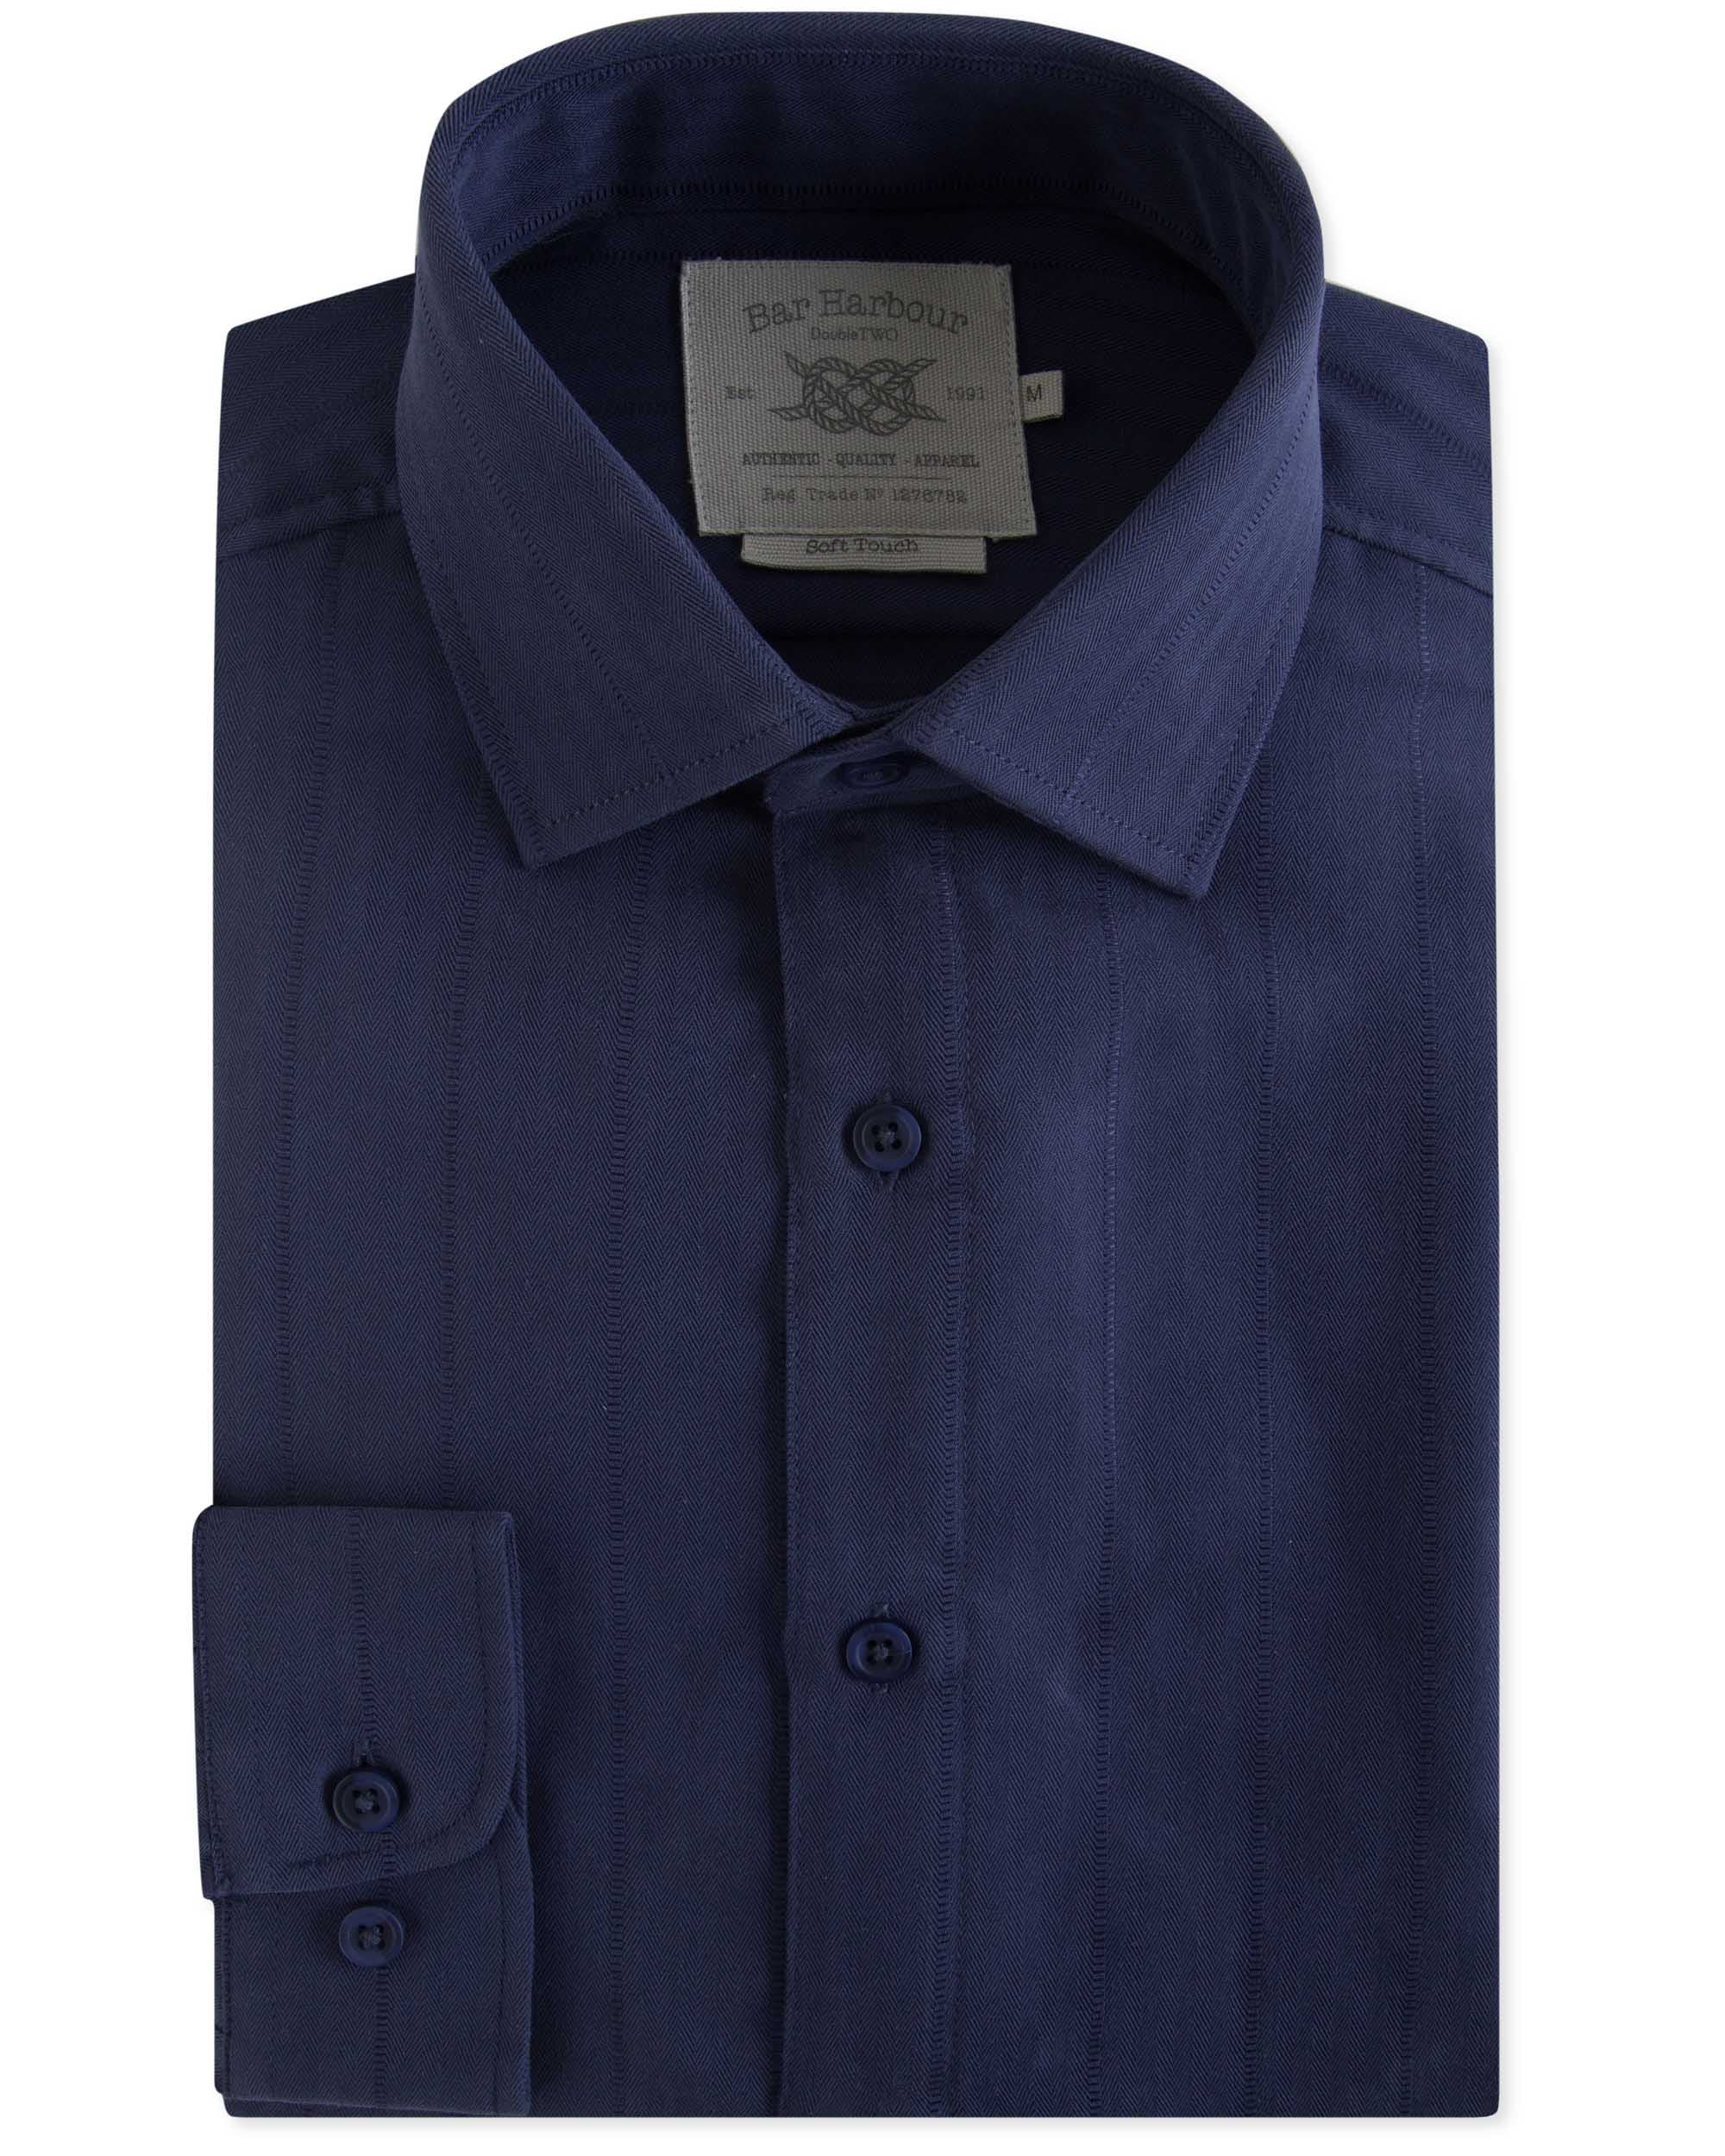 Herringbone Weave Shirt